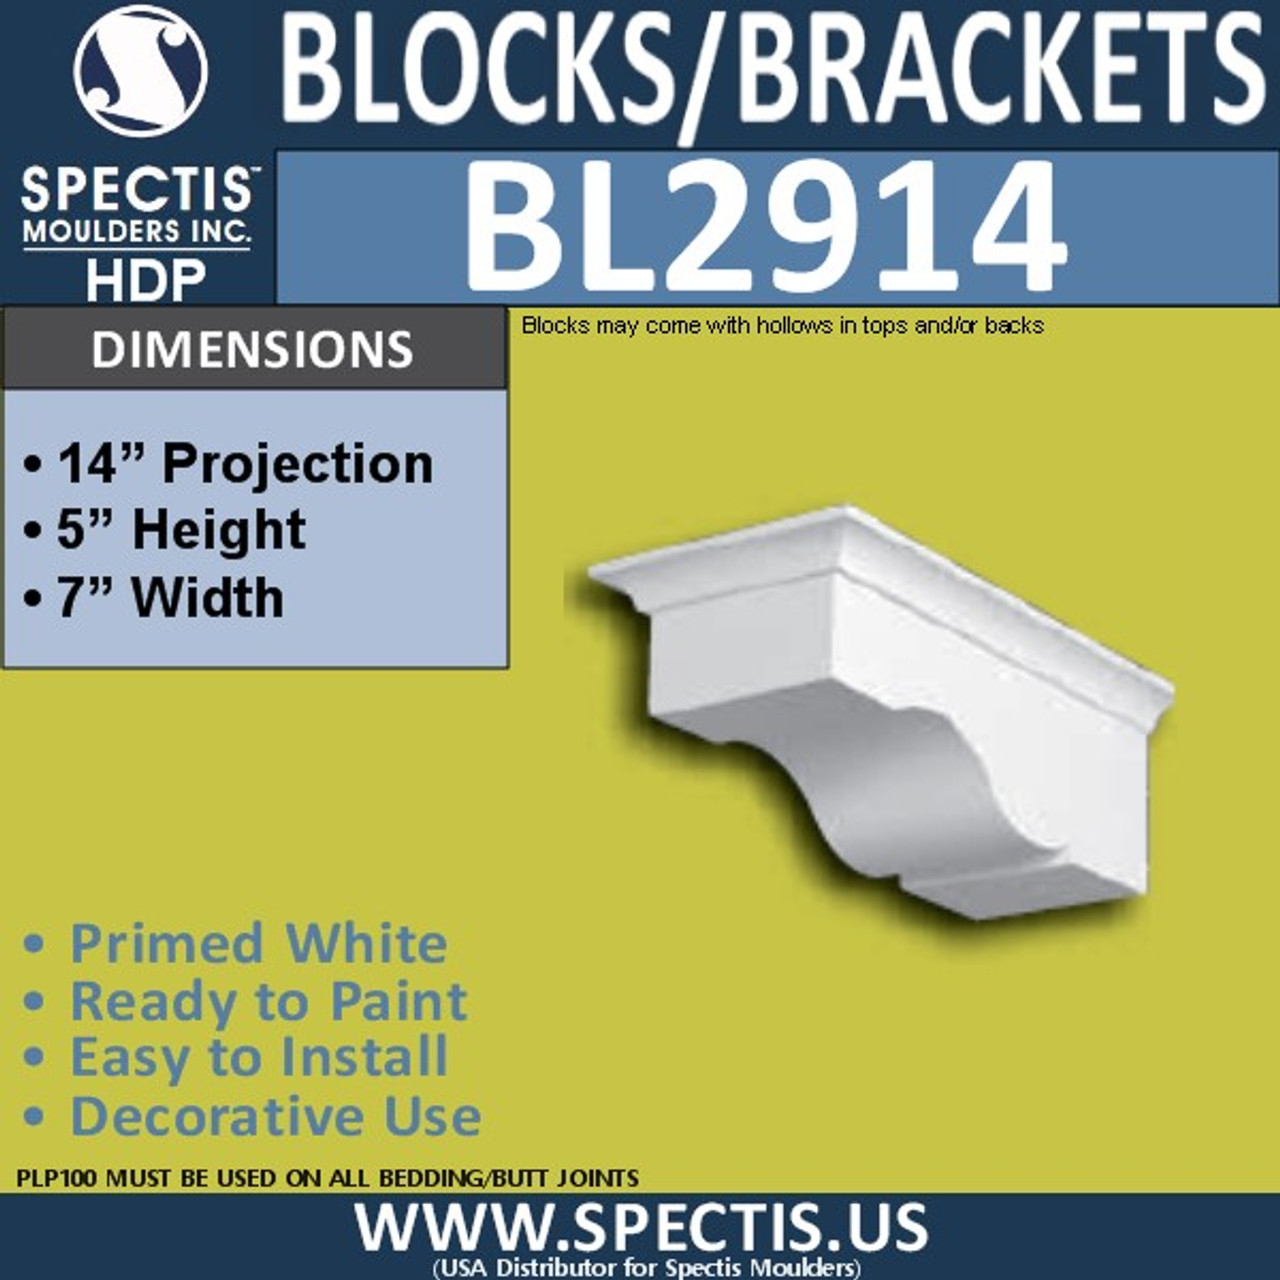 "BL2914 Eave Block or Bracket 7""W x 5""H x 14"" P"